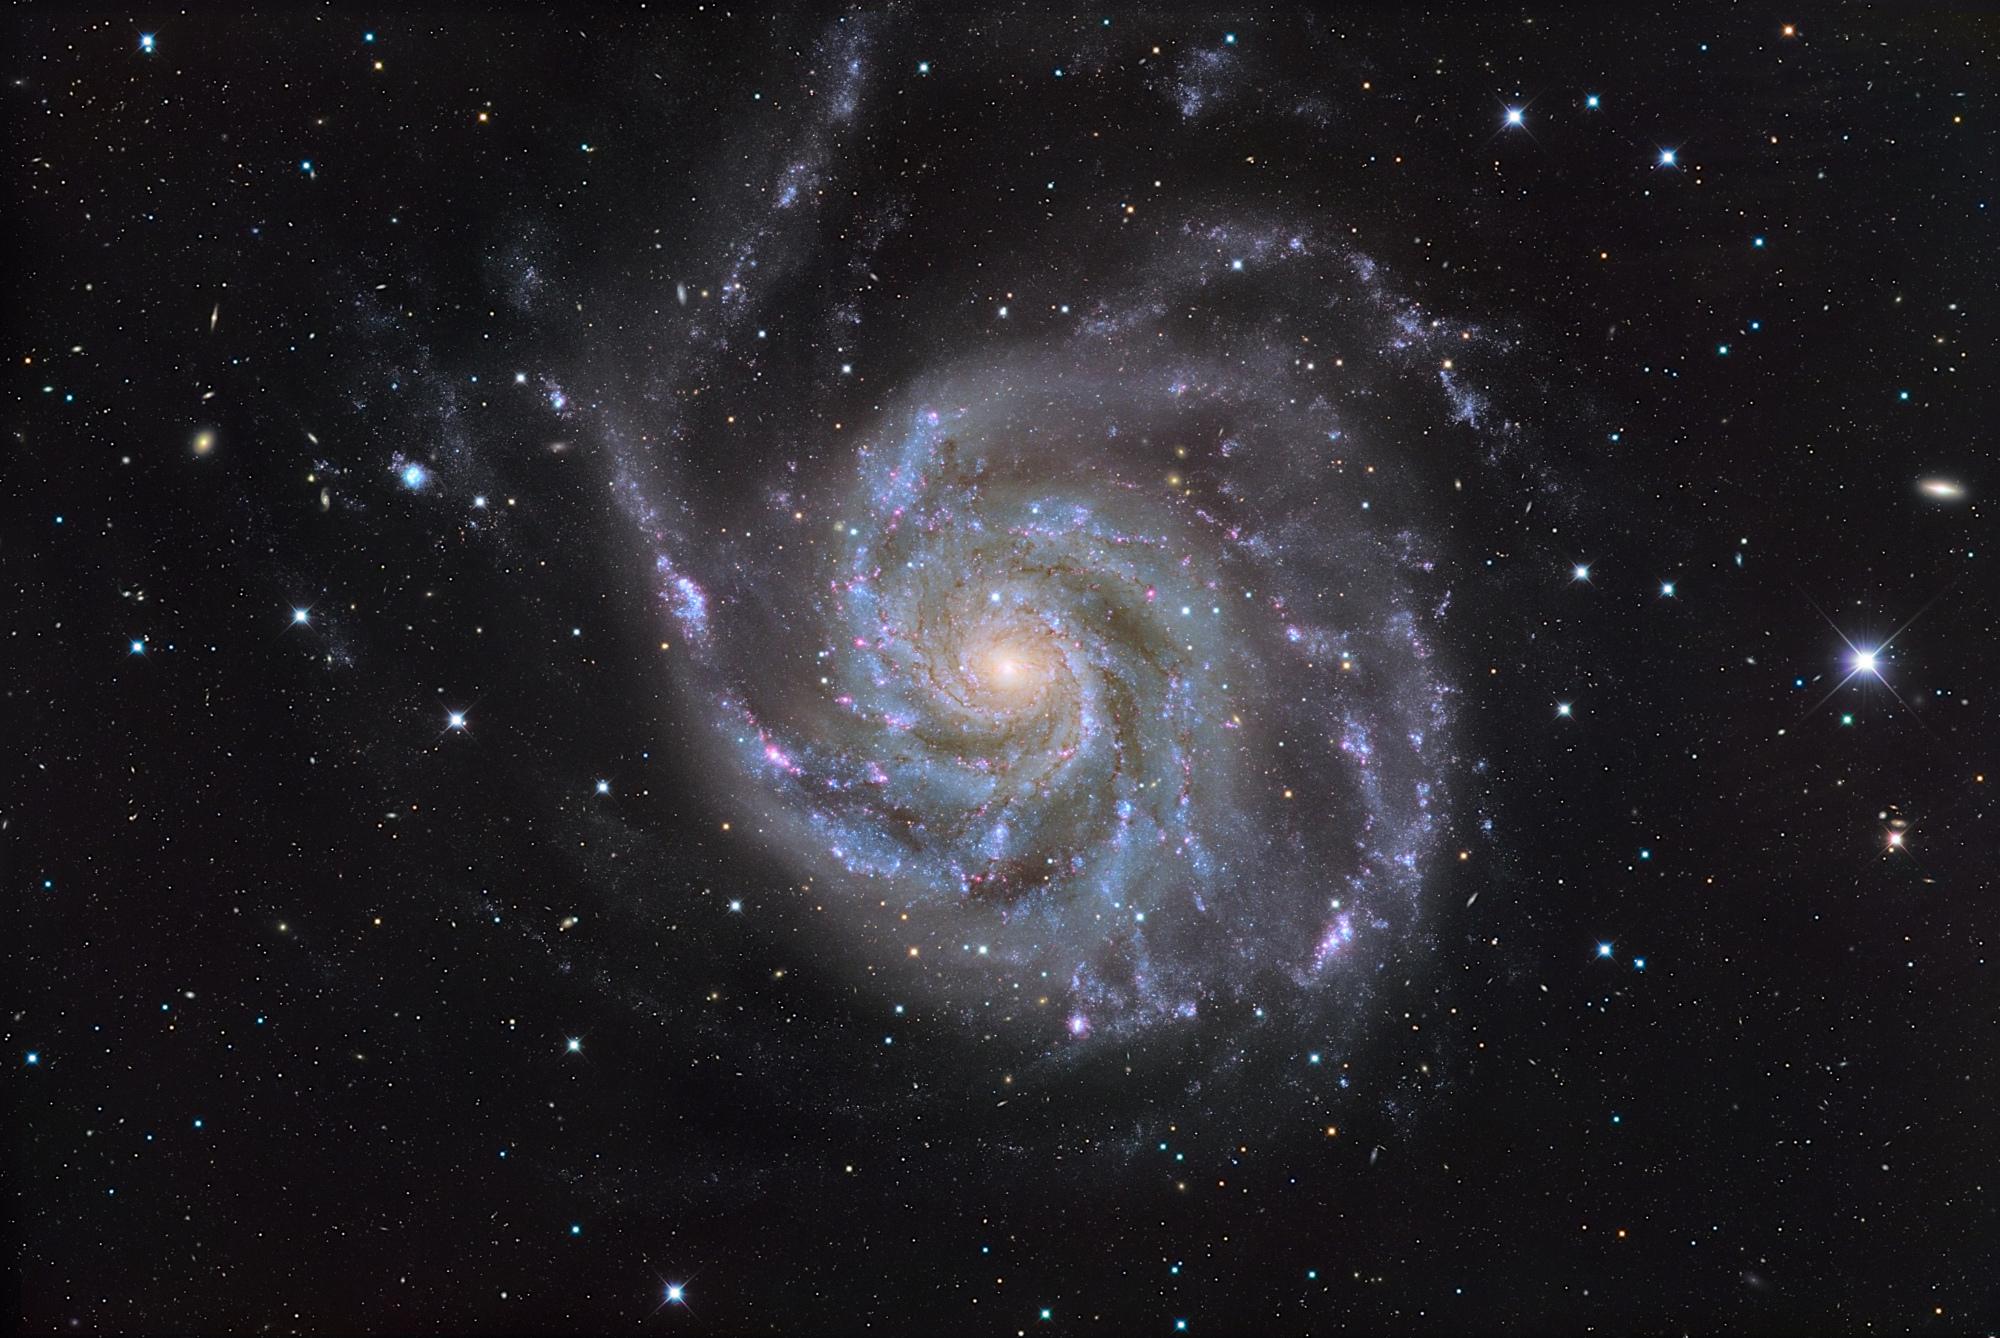 M101LRVB_C2PU-Py.thumb.jpg.07ce26ec05b0923023ab86b0a8a72b8e.jpg